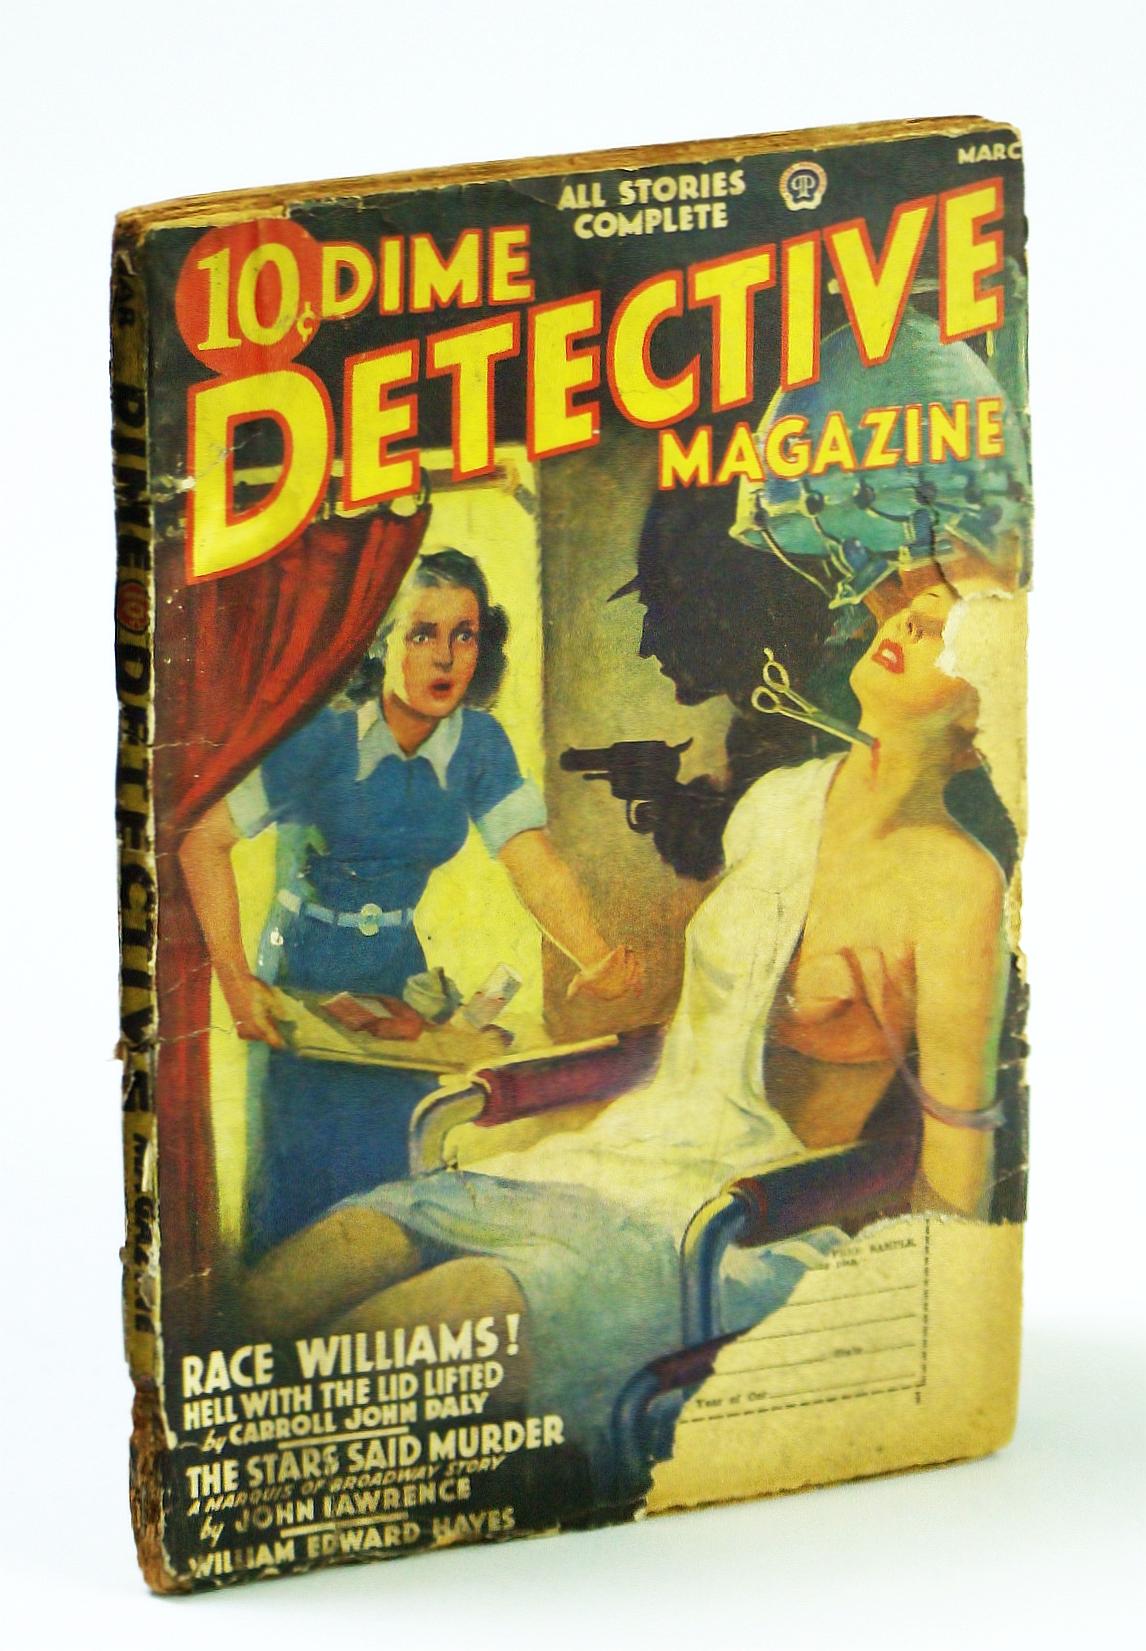 Image for Dime Detective Magazine, March (Mar.) 1939, Vol 29, No. 4